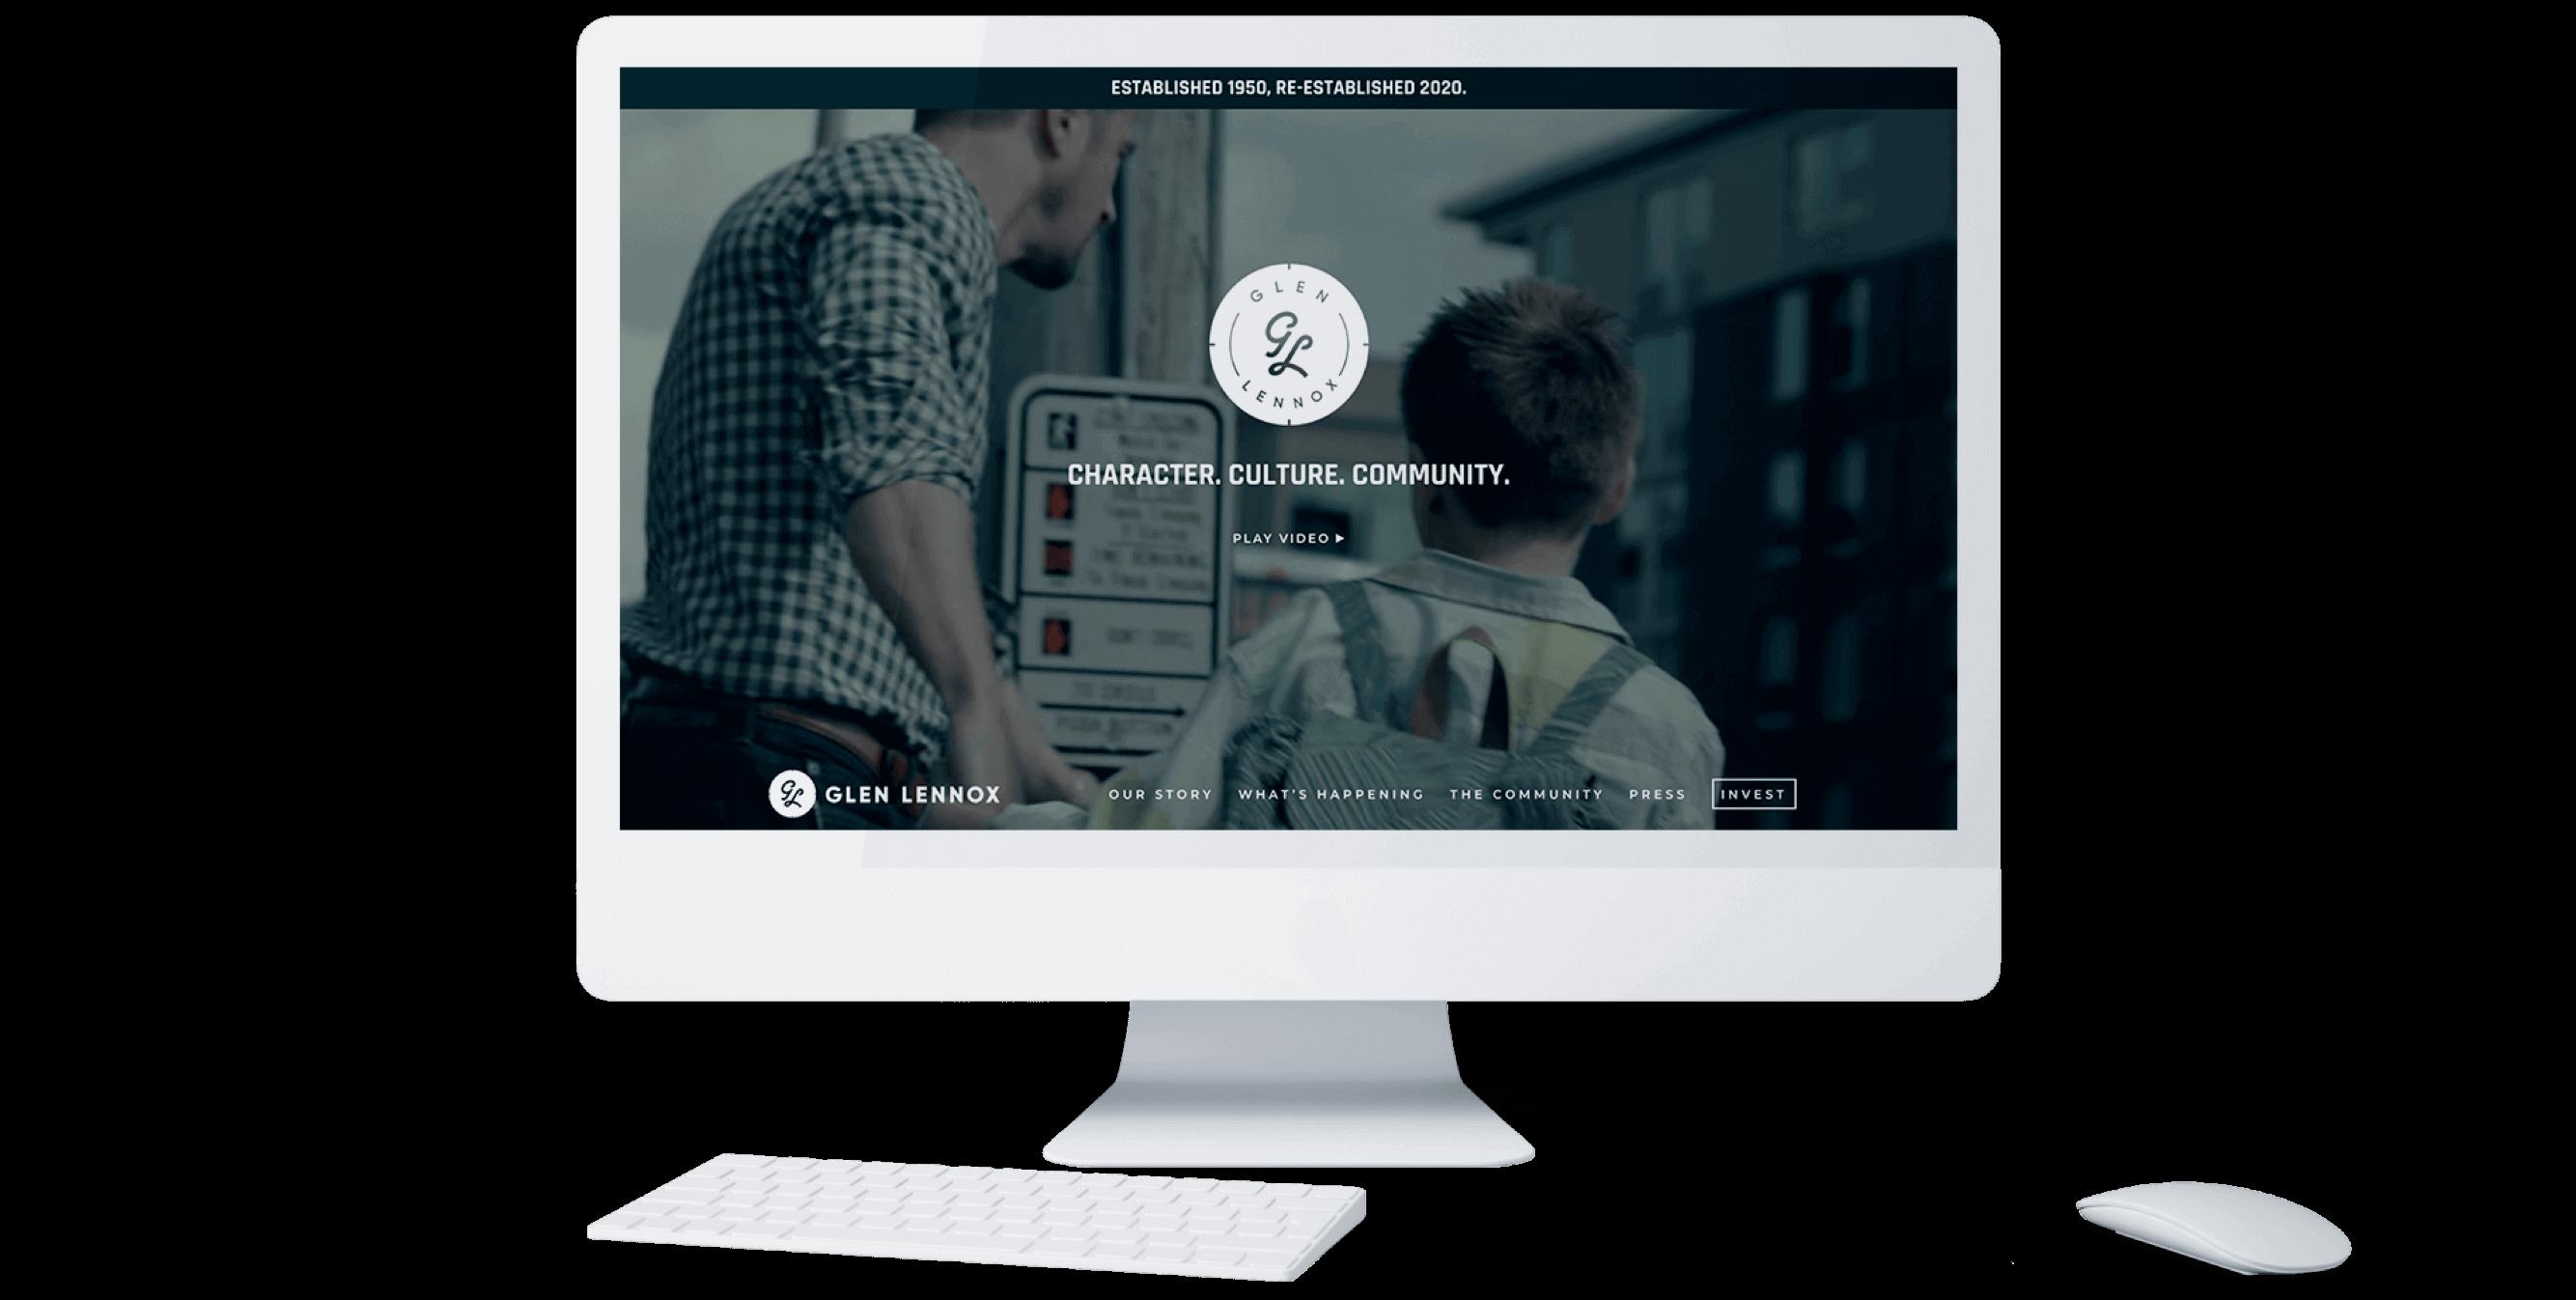 Glen Lennox Homepage on desktop computer